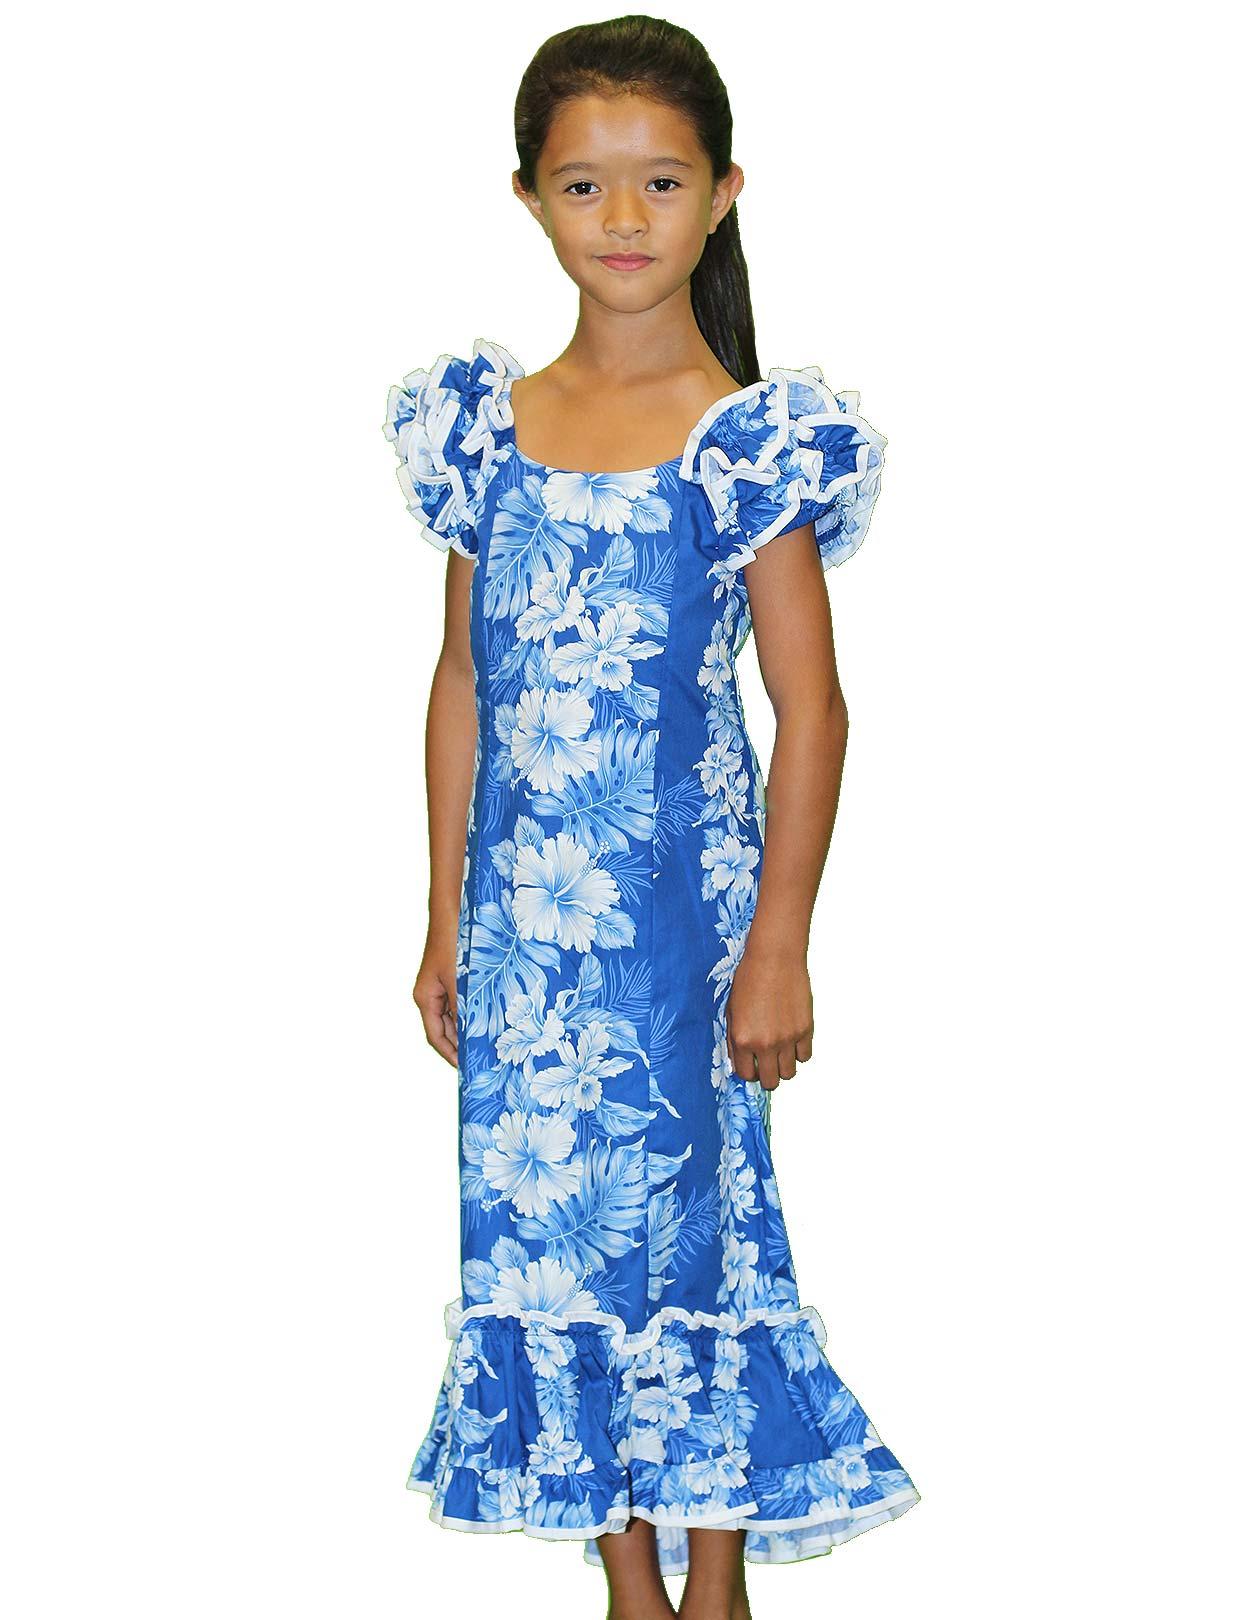 Girls Ruffled Royal Blue Muumuu Dress Haku Laape Shaka